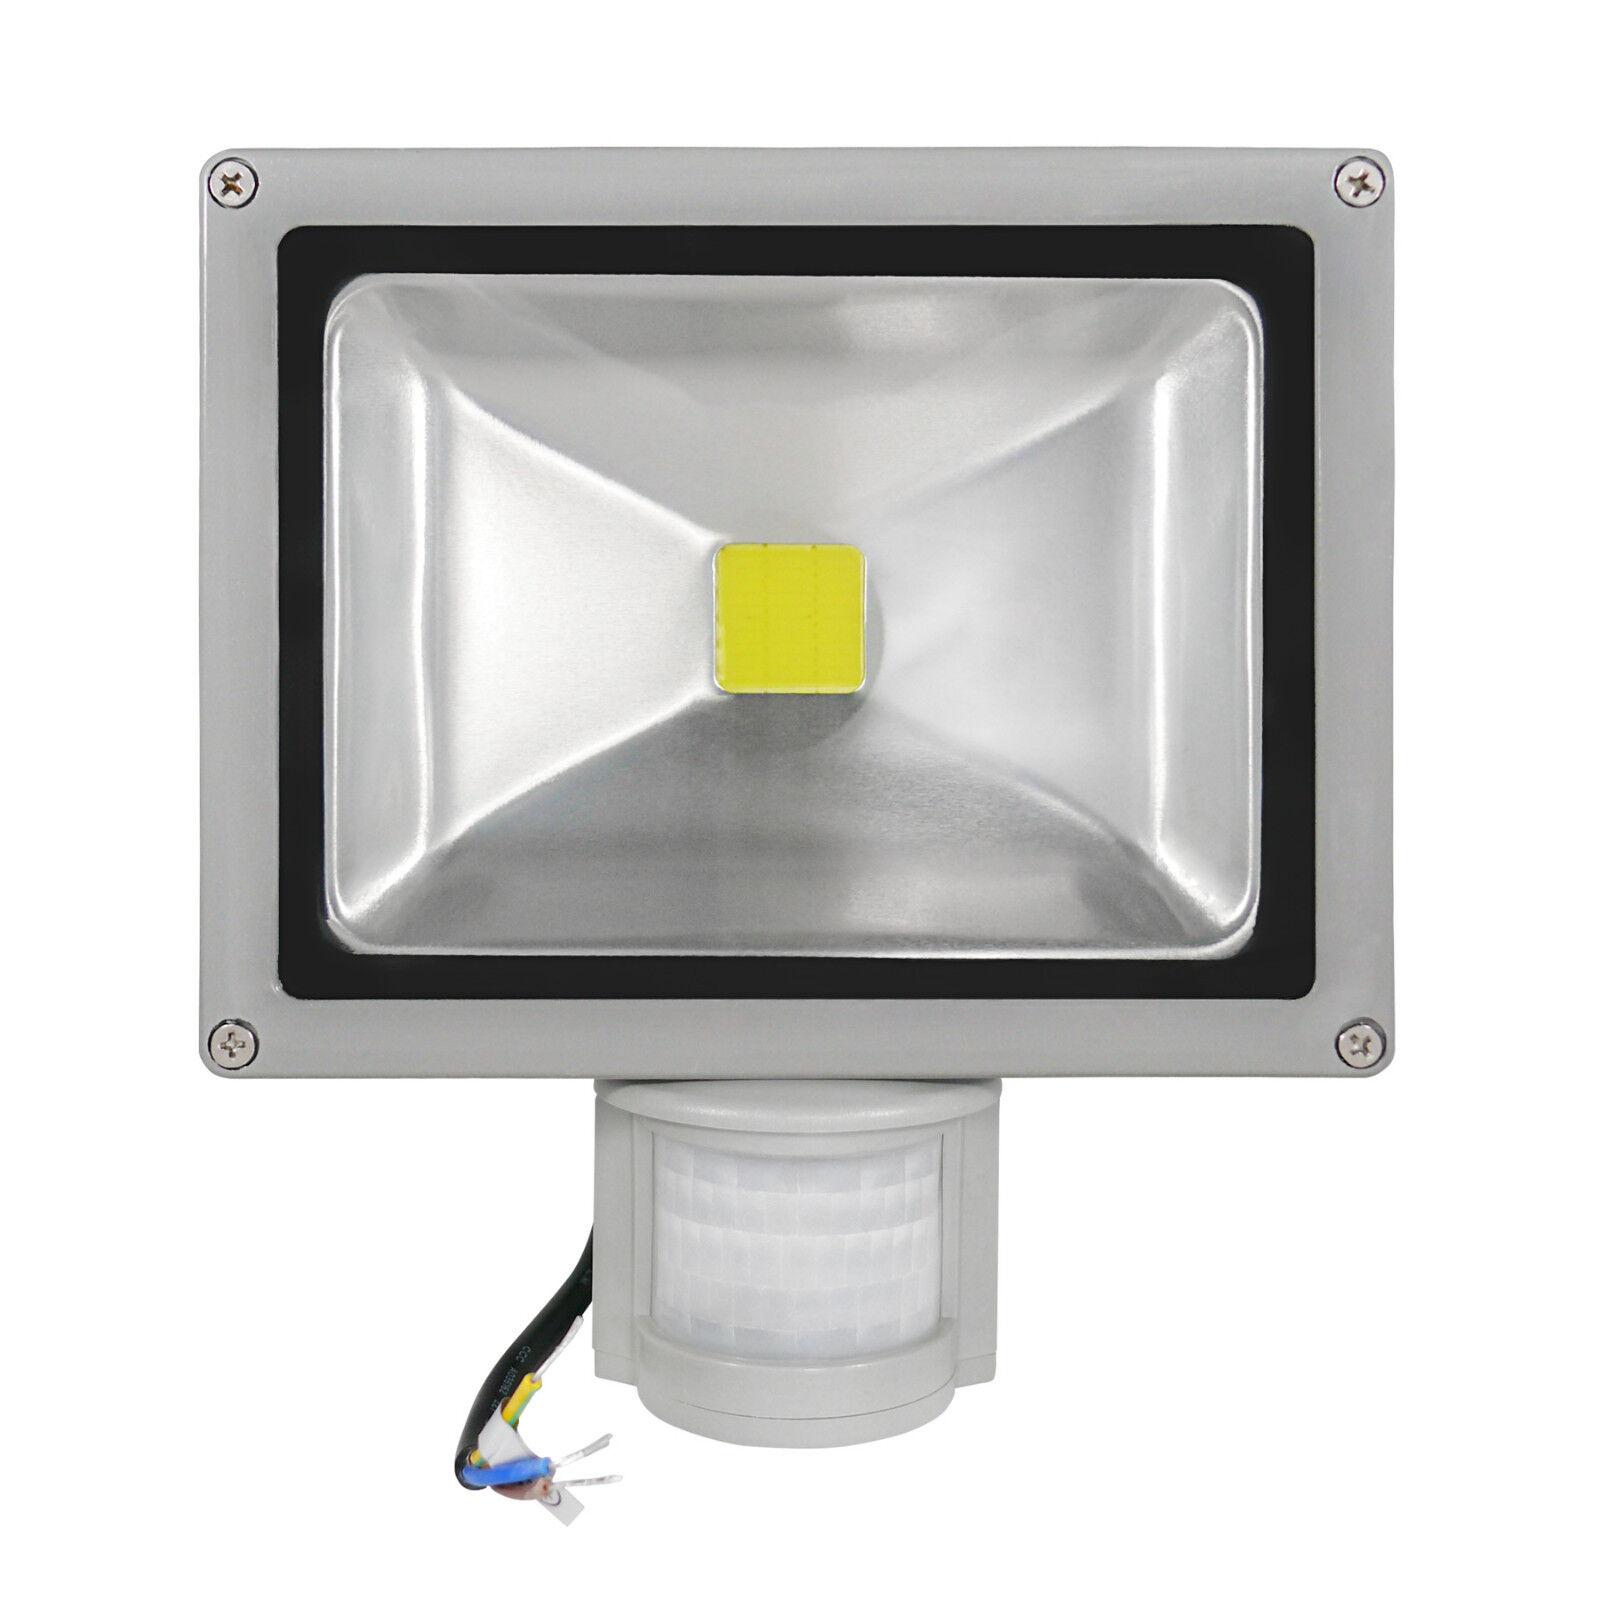 2x LED eh con detector de movimiento LED reflector colocado LED emisor 30 vatios blancoo fria